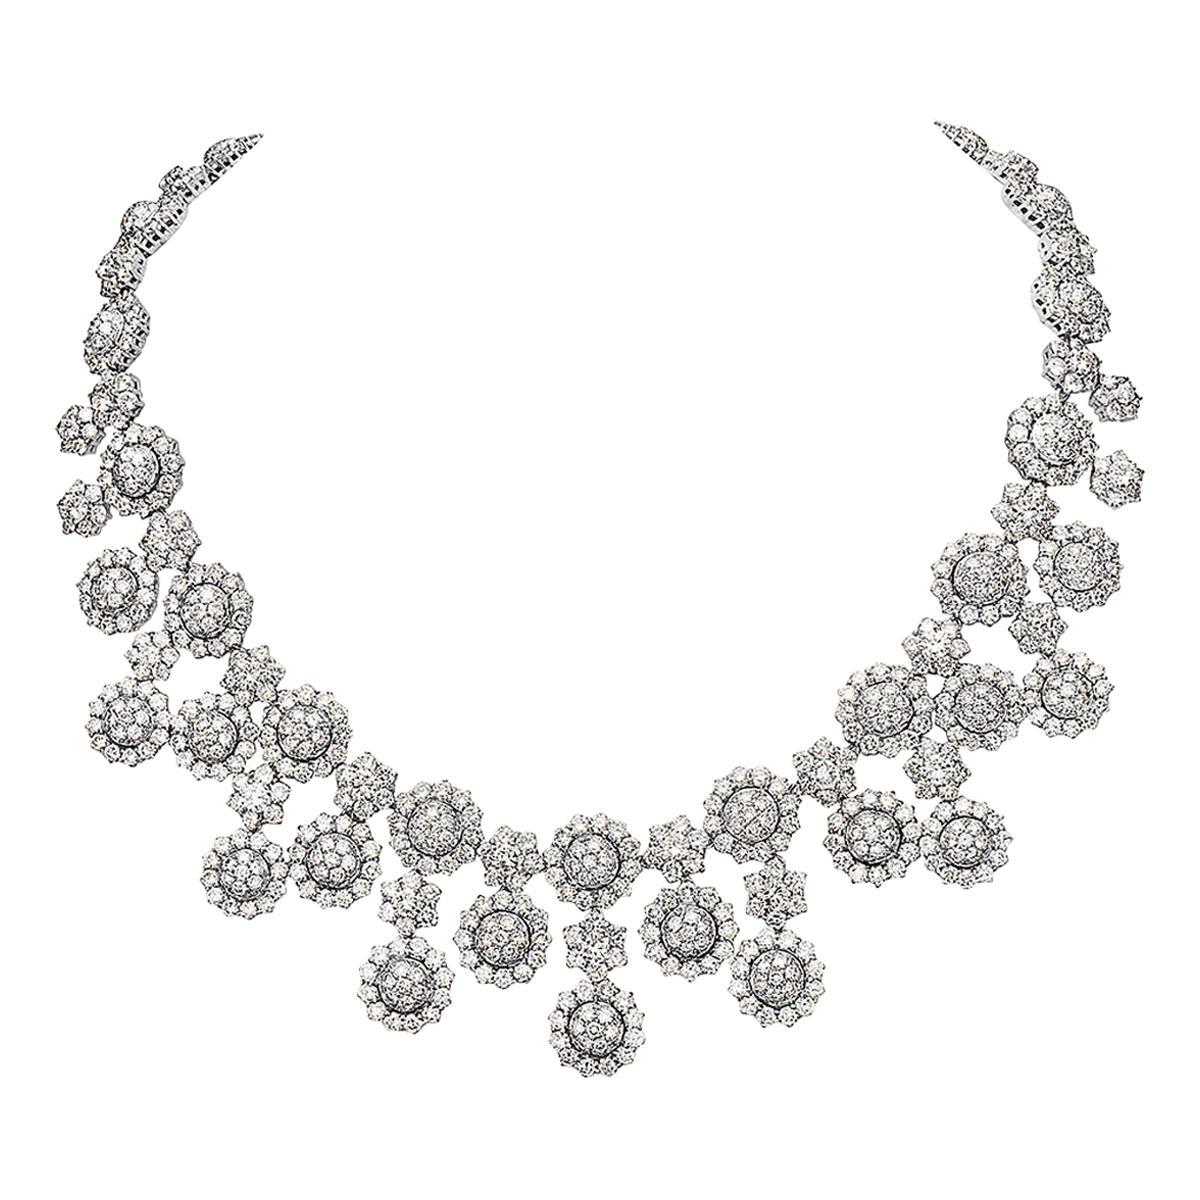 56.18 Carat Round Diamond Necklace 18 Karat White Gold High Collar Necklace